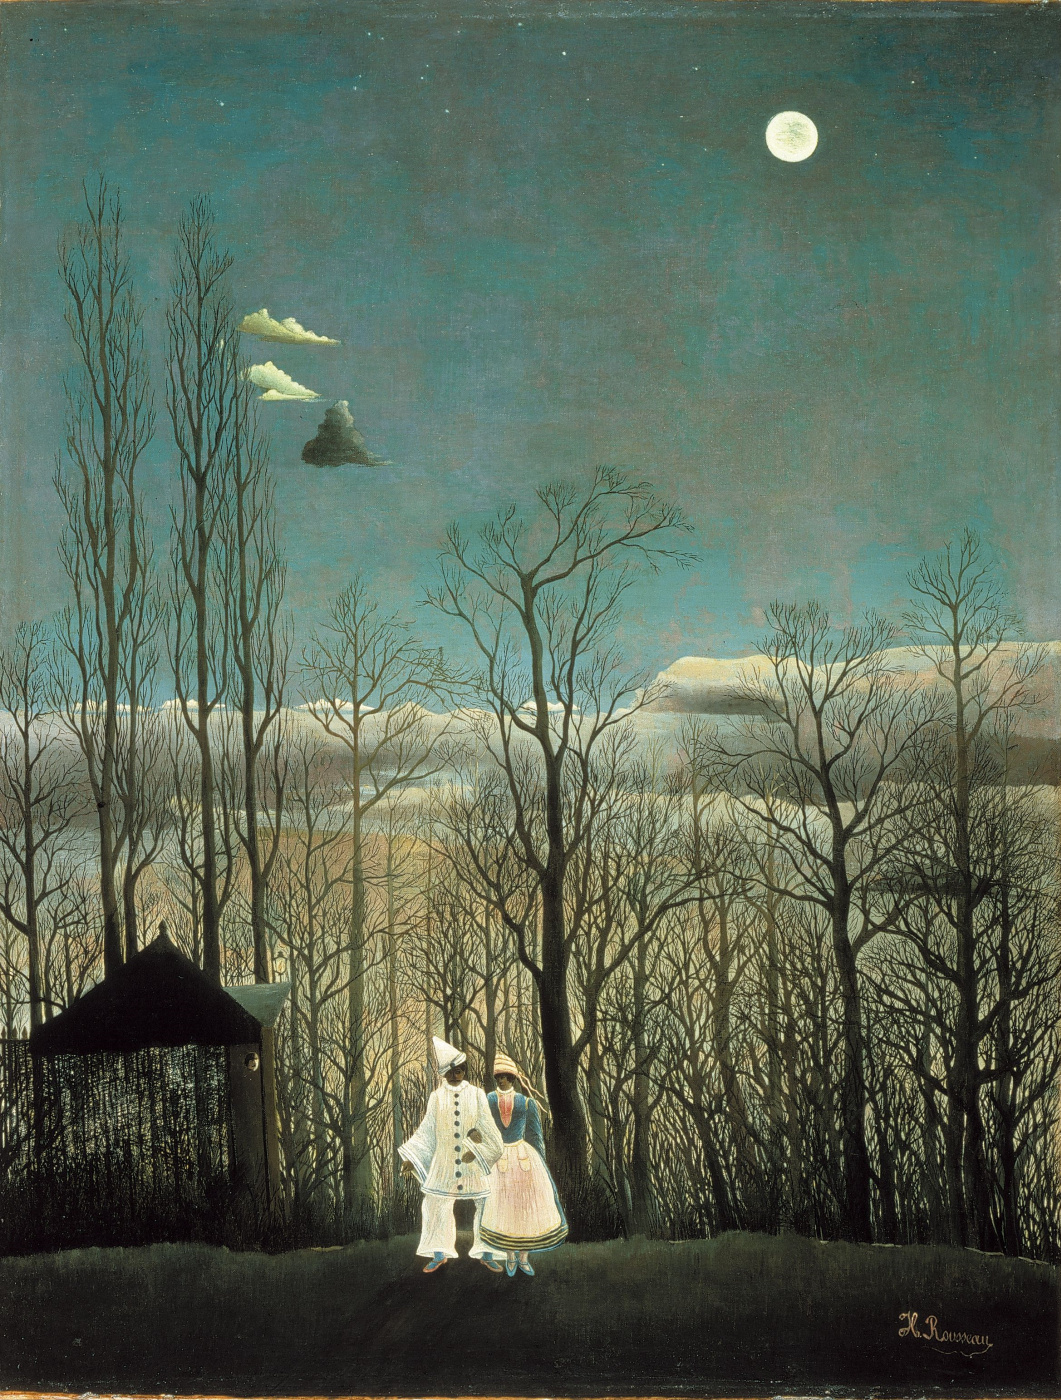 Henri Rousseau. Carnival evening